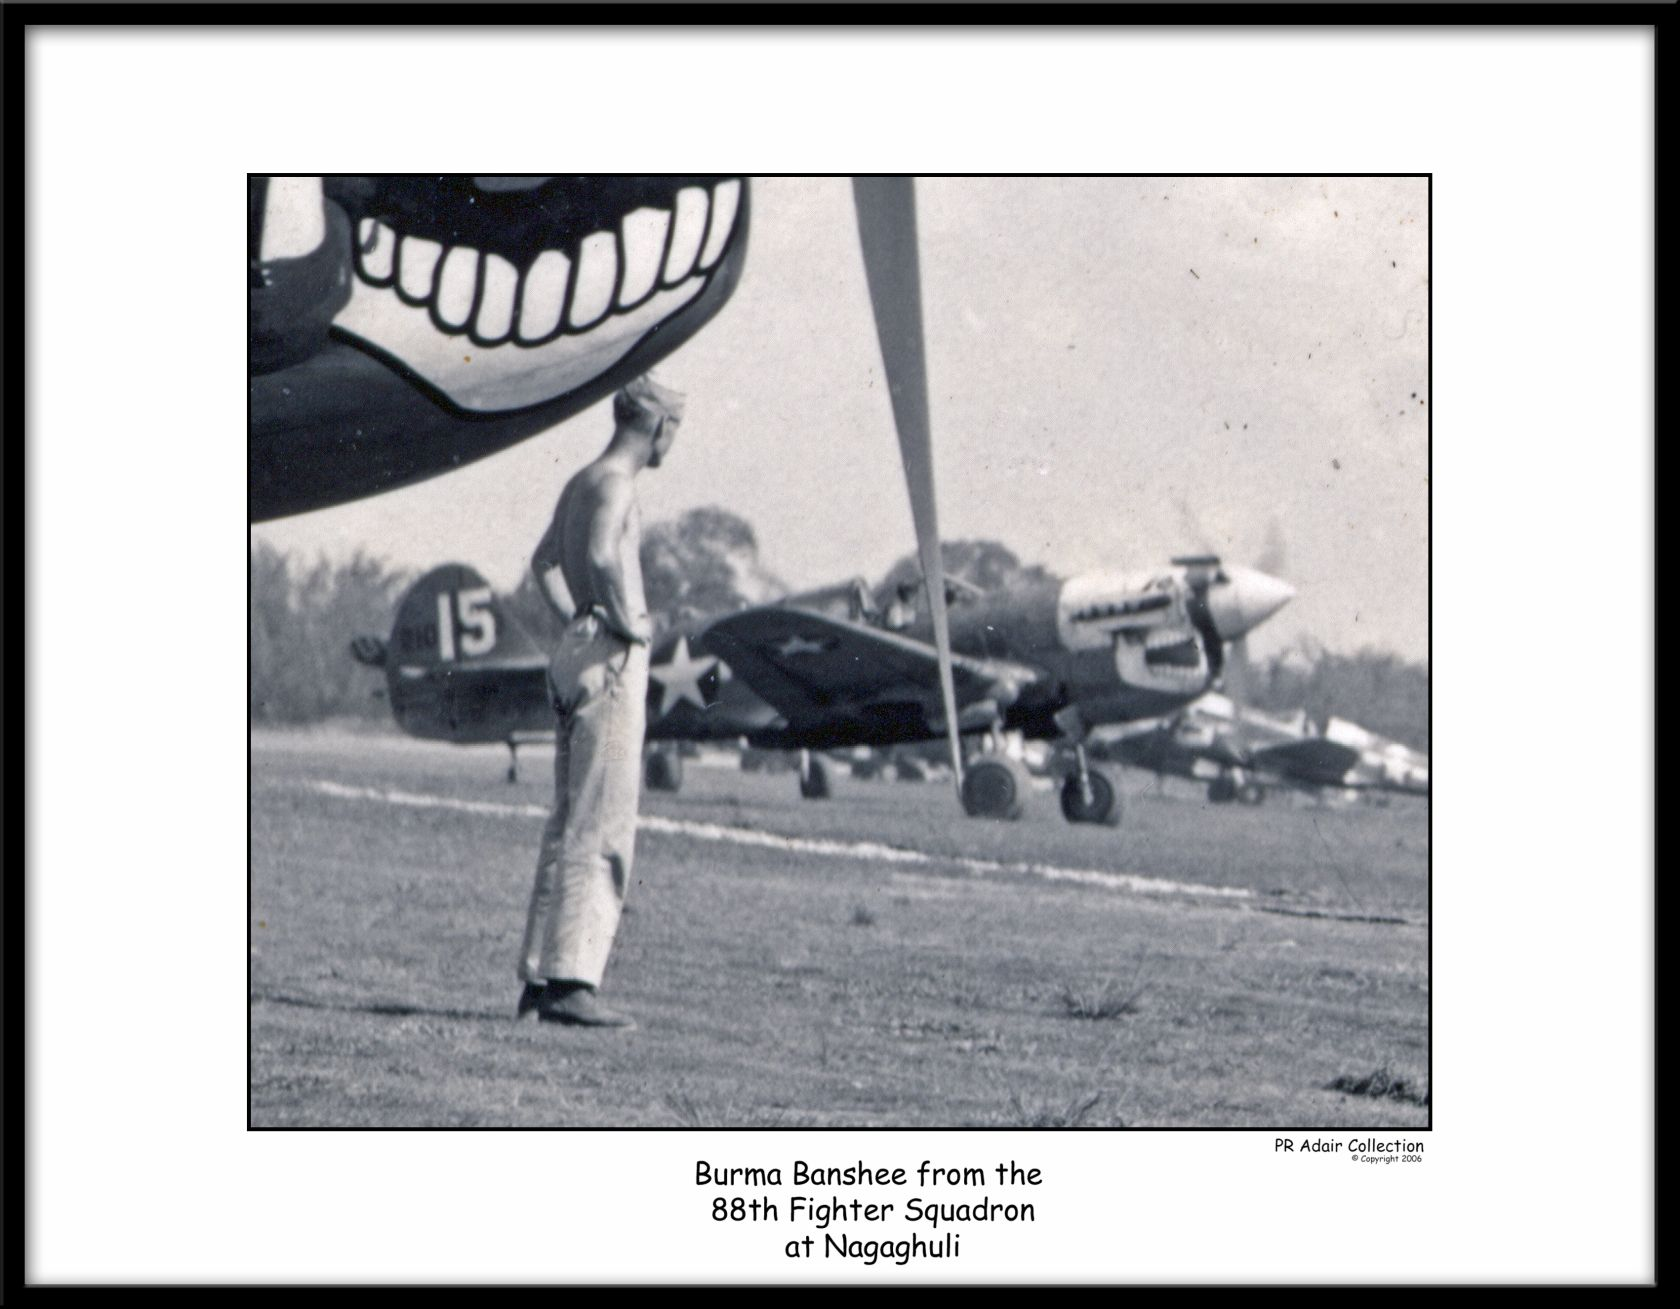 Burma Banshee 156